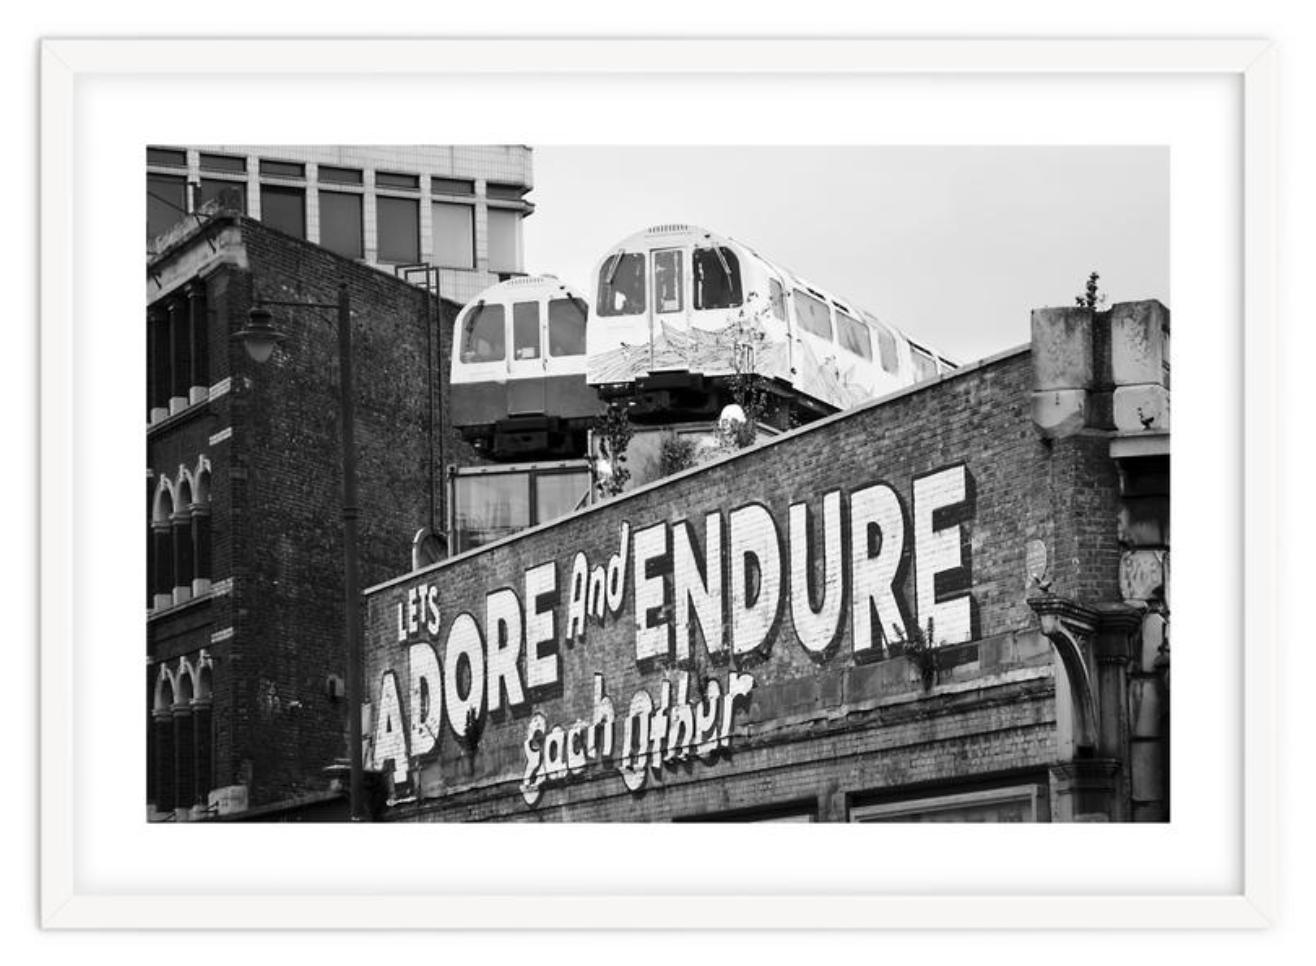 Adore, Urban London